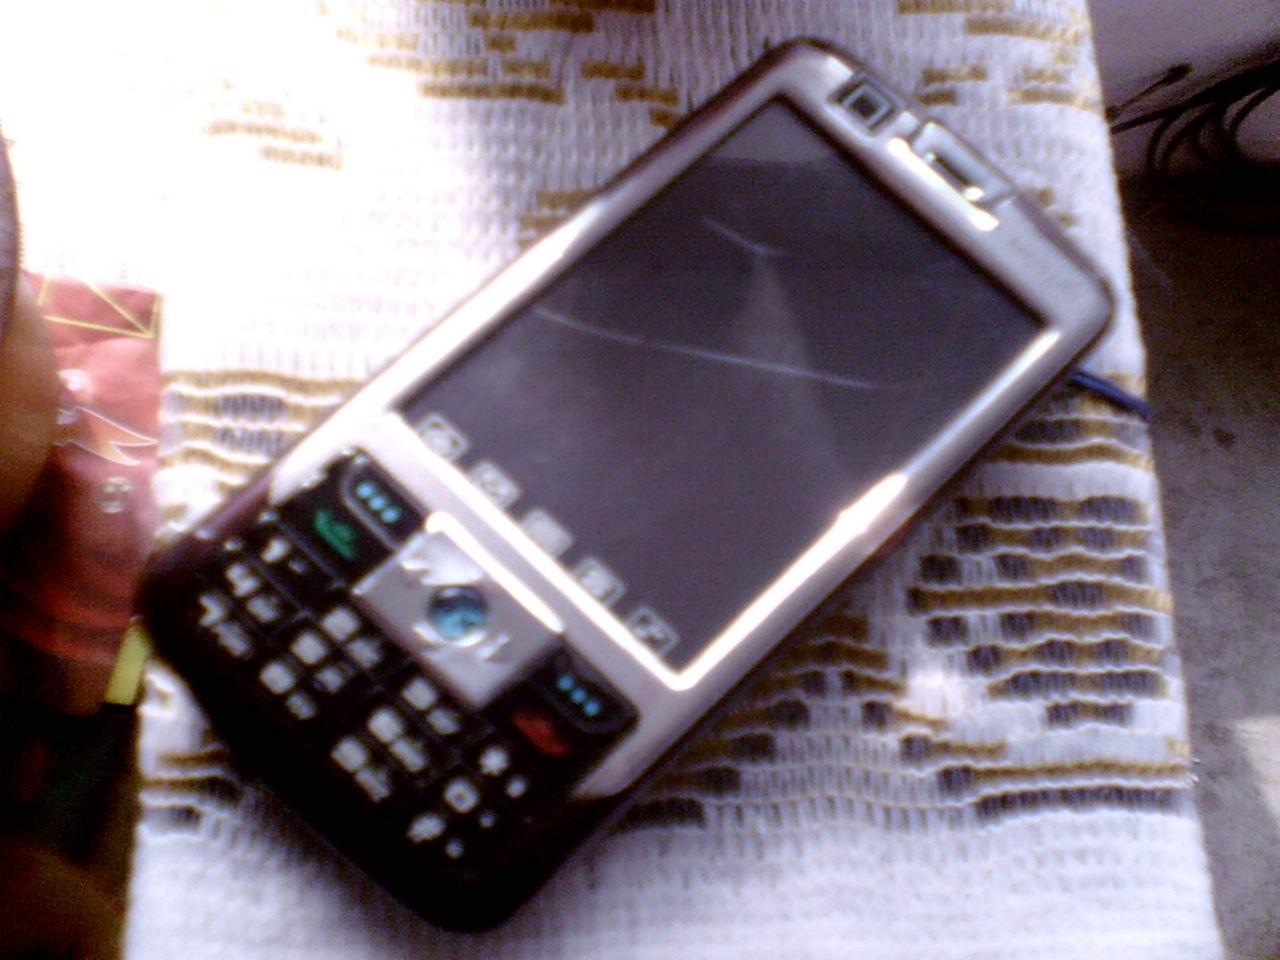 opa37手机多上钱